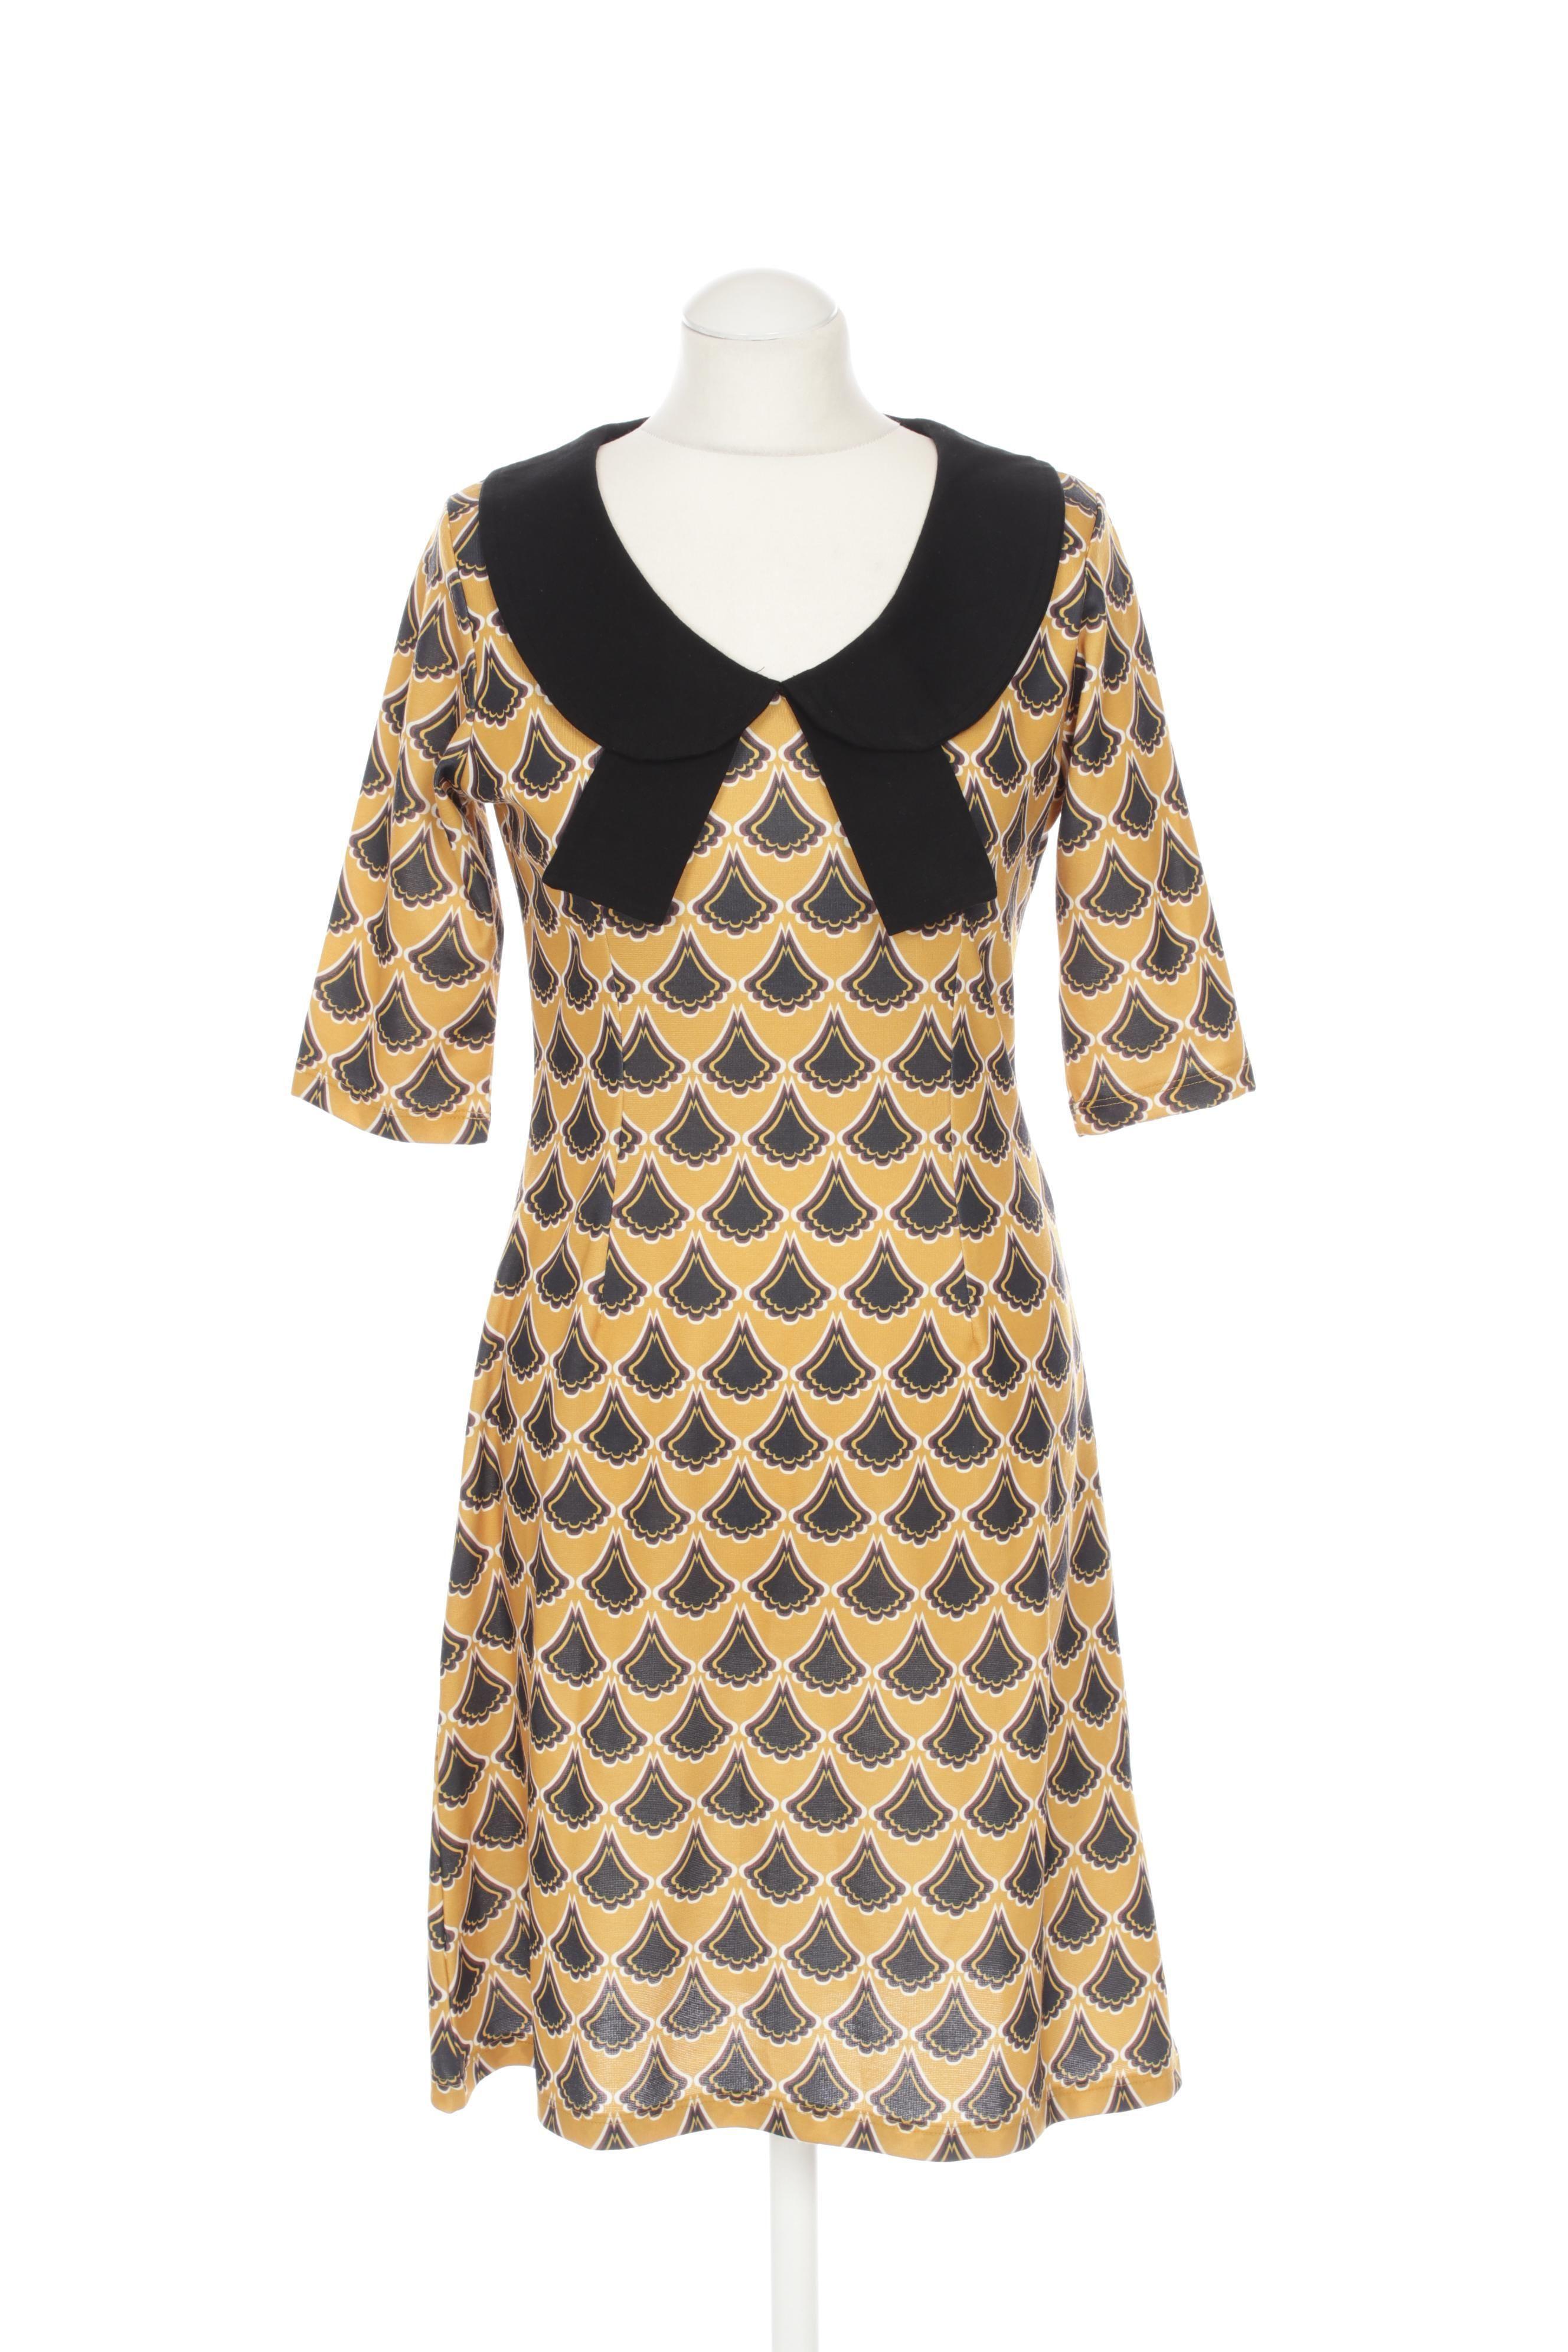 ubup   Lindy Bop Damen Kleid INT M Second Hand kaufen ...